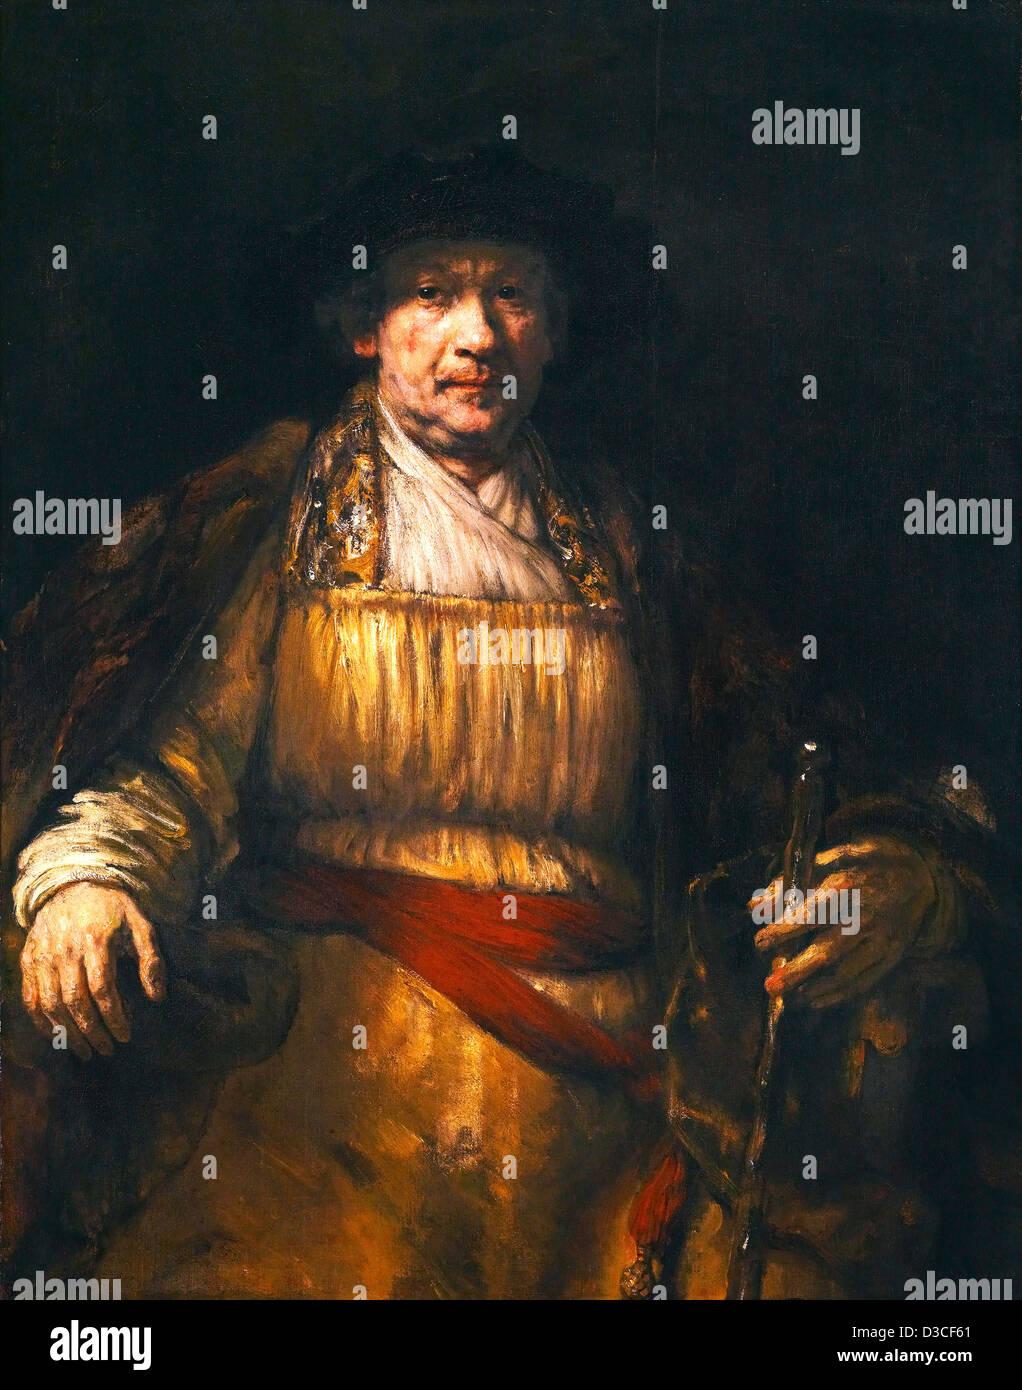 Rembrandt van Rijn, Self-portrait. 1658 Oil on canvas. Frick Collection, New York. Stock Photo